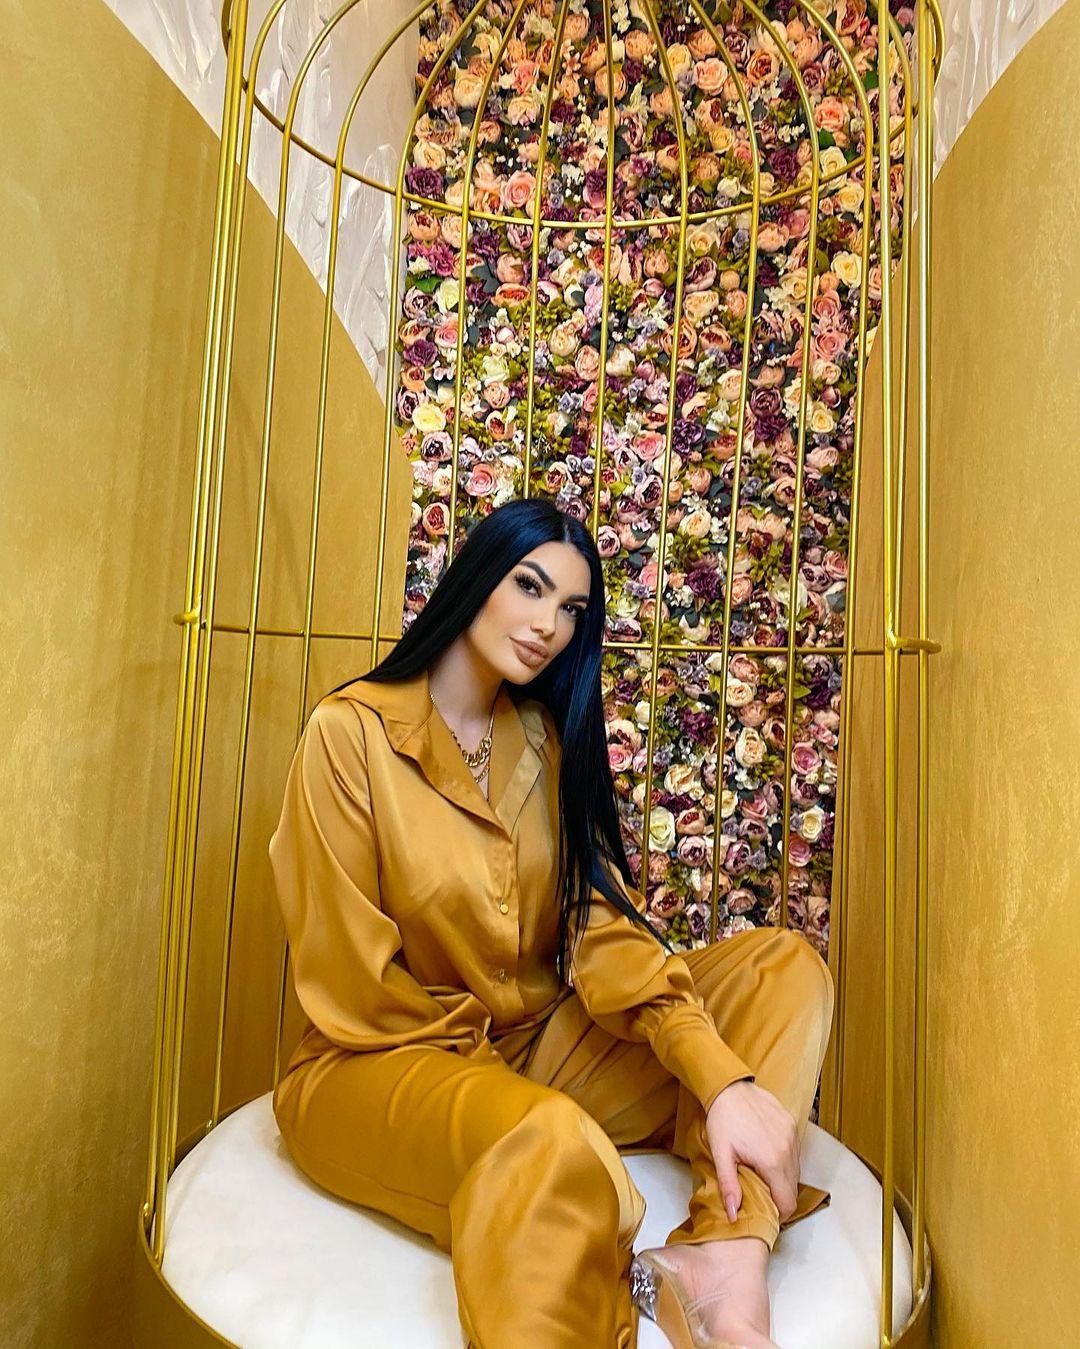 Zaimina-Vasjari-Wallpapers-Insta-Fit-Bio-4